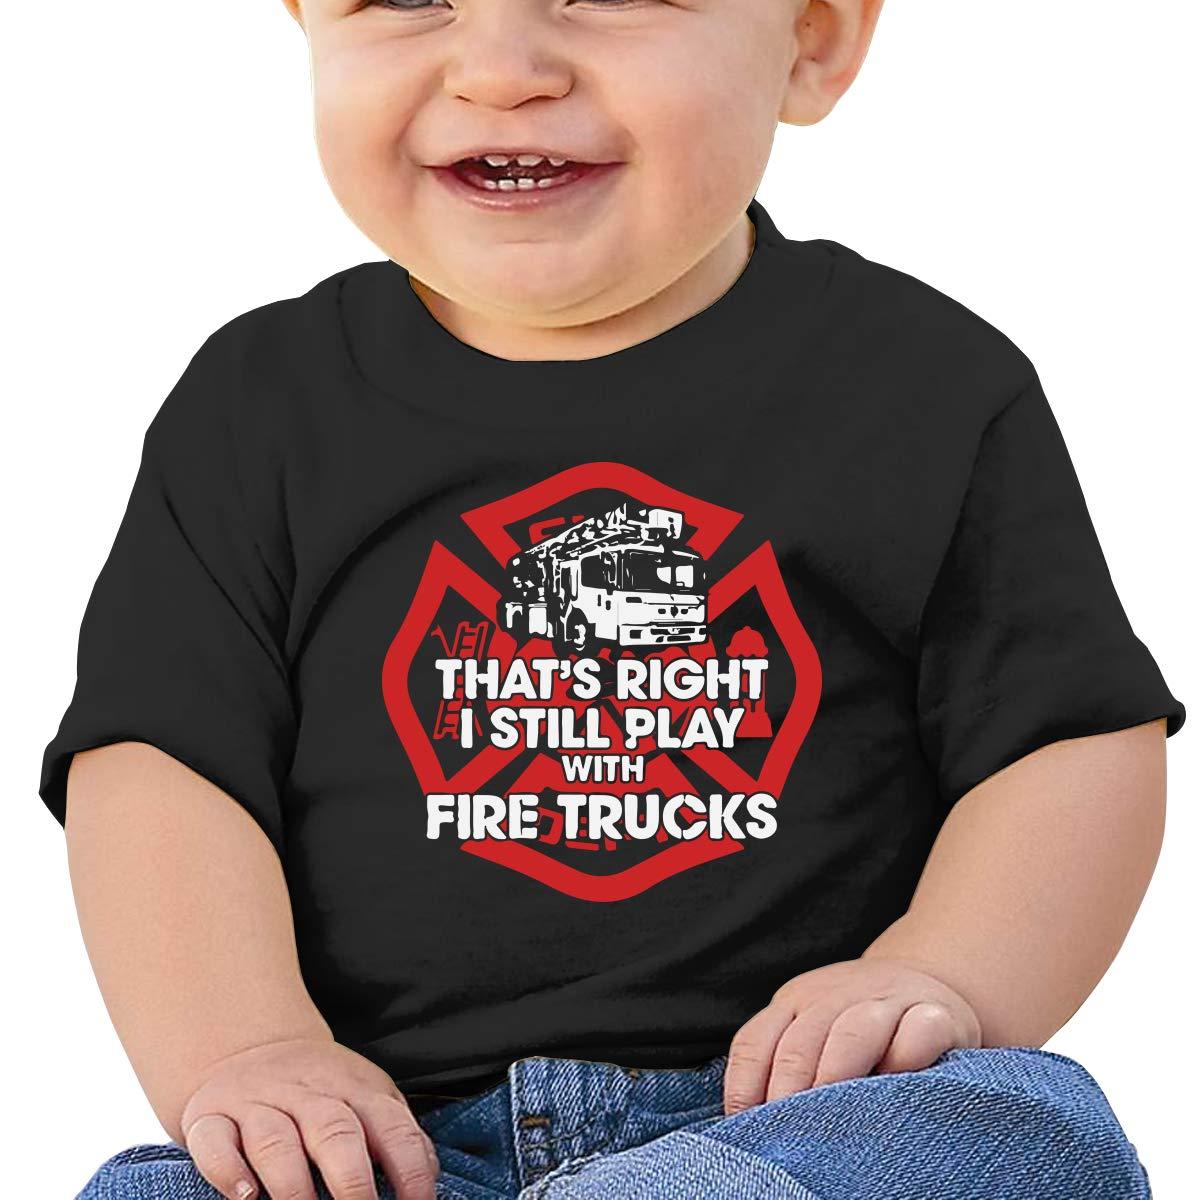 I Still Play with Fire Trucks Newborn Baby Short Sleeve Crew Neck Tee Shirt 6-18 Month Tops